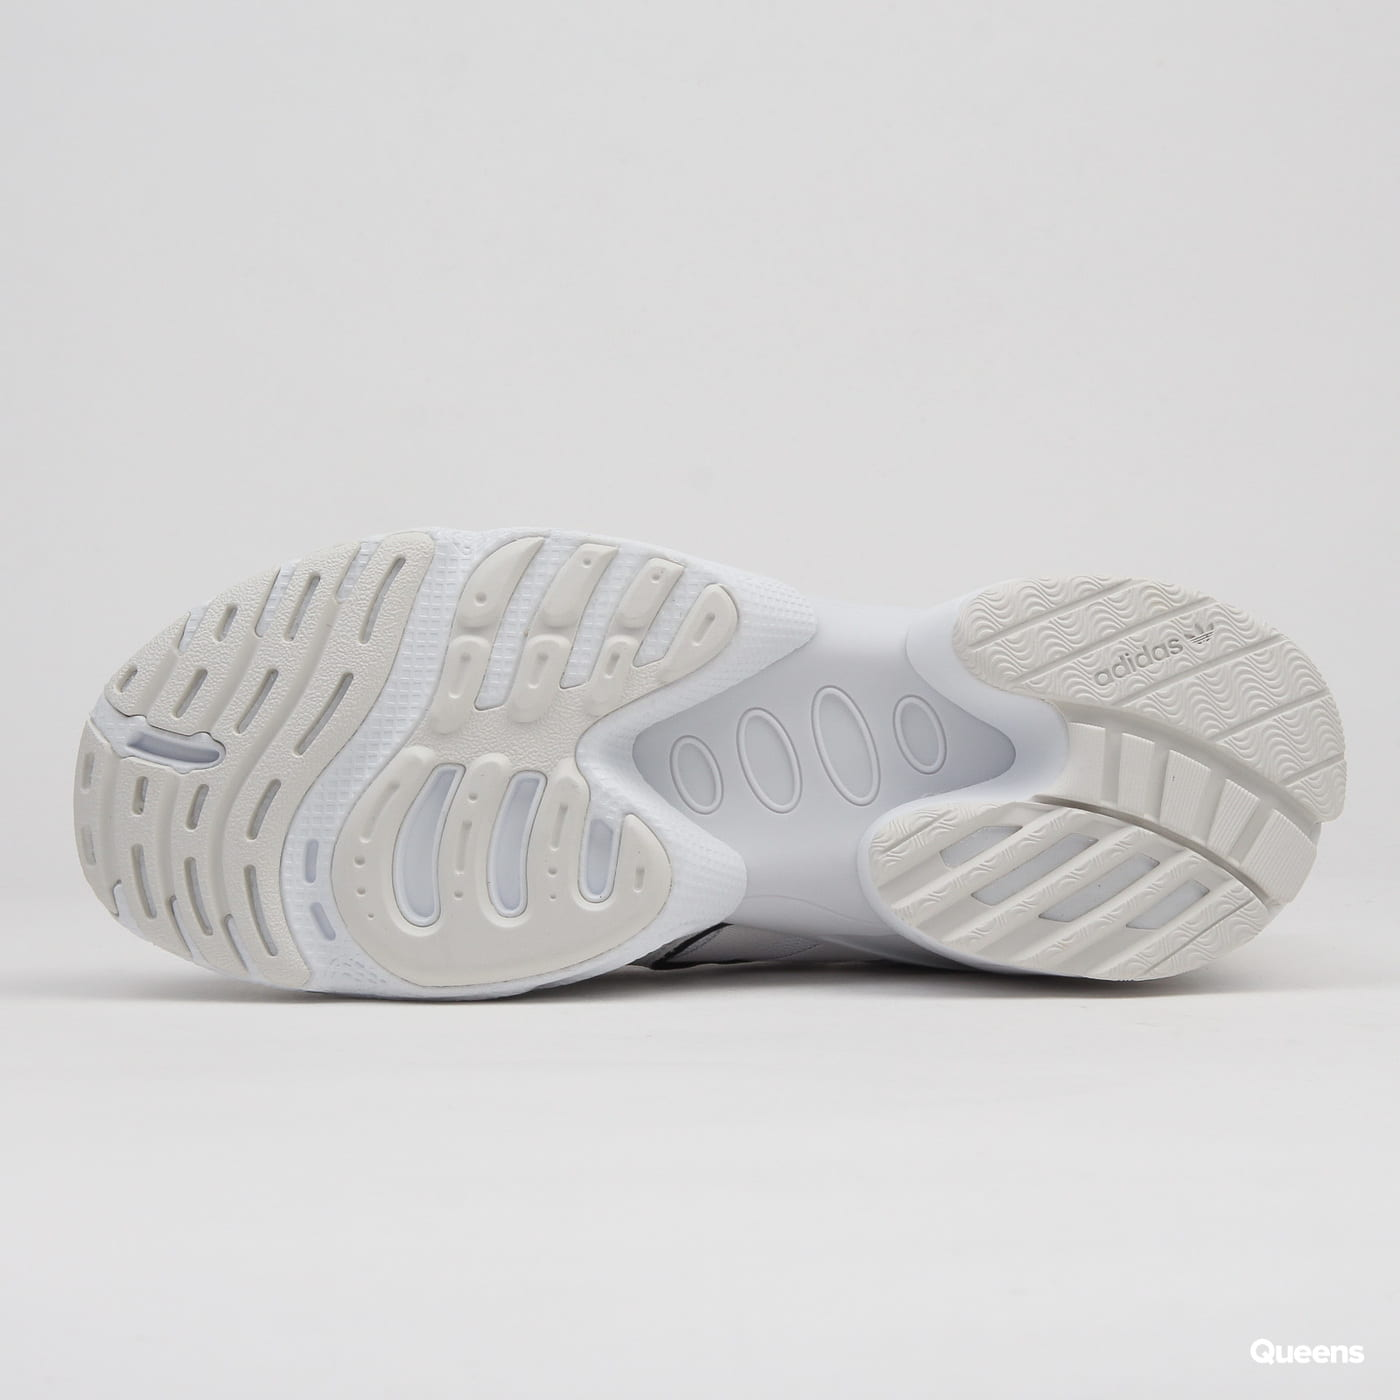 adidas Originals EQT Gazelle crywht / crywht / cblack